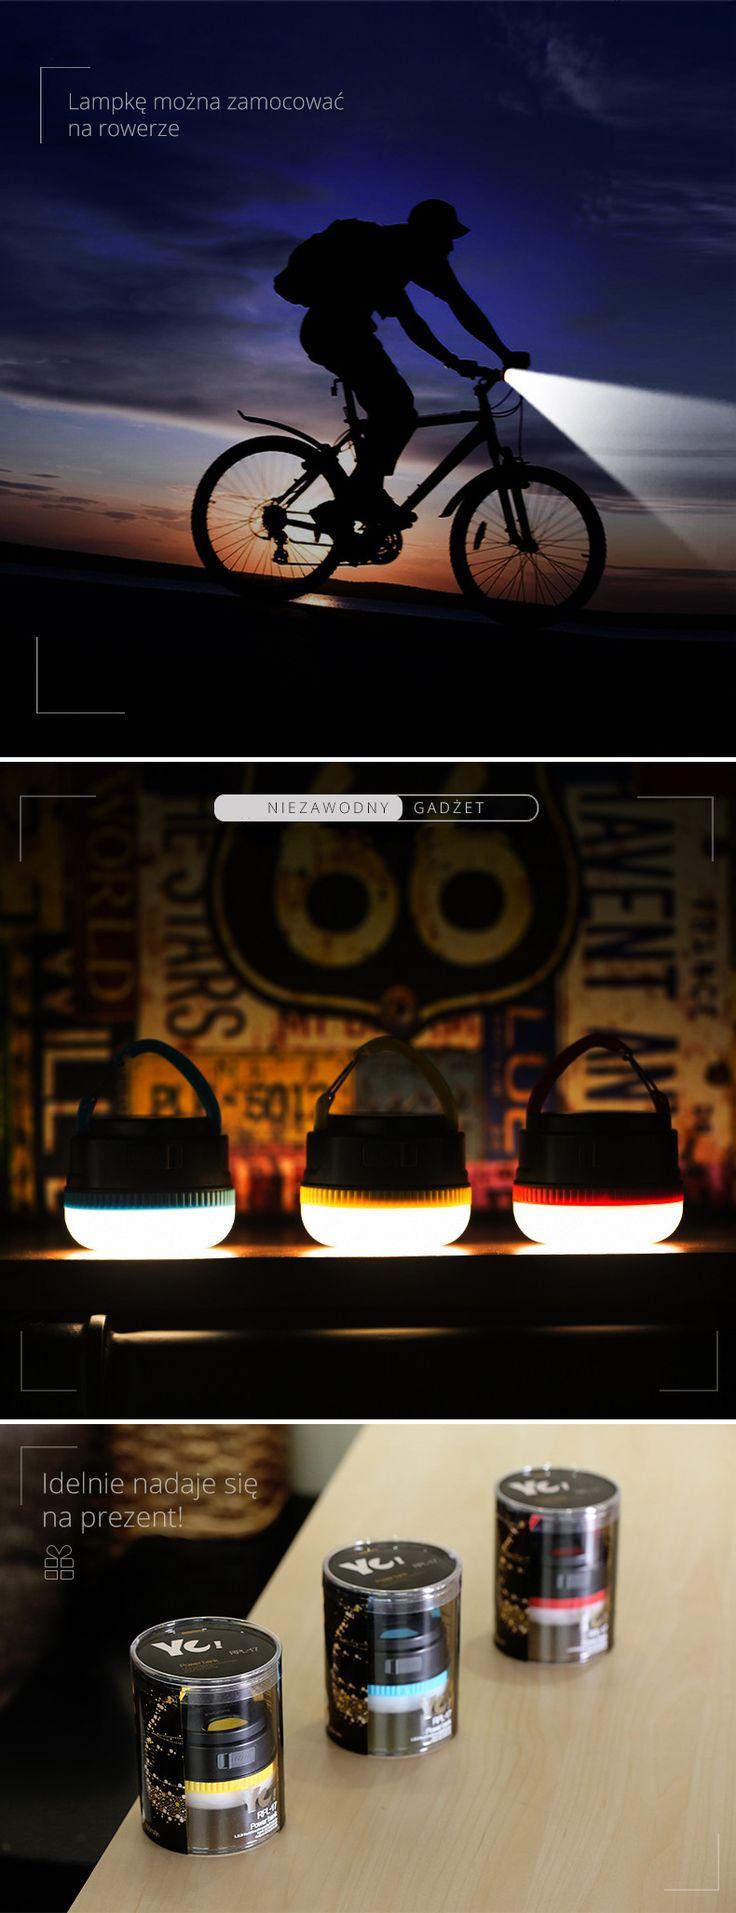 Lampka LED przenośny bank energii 3000mAh Remax niebieska